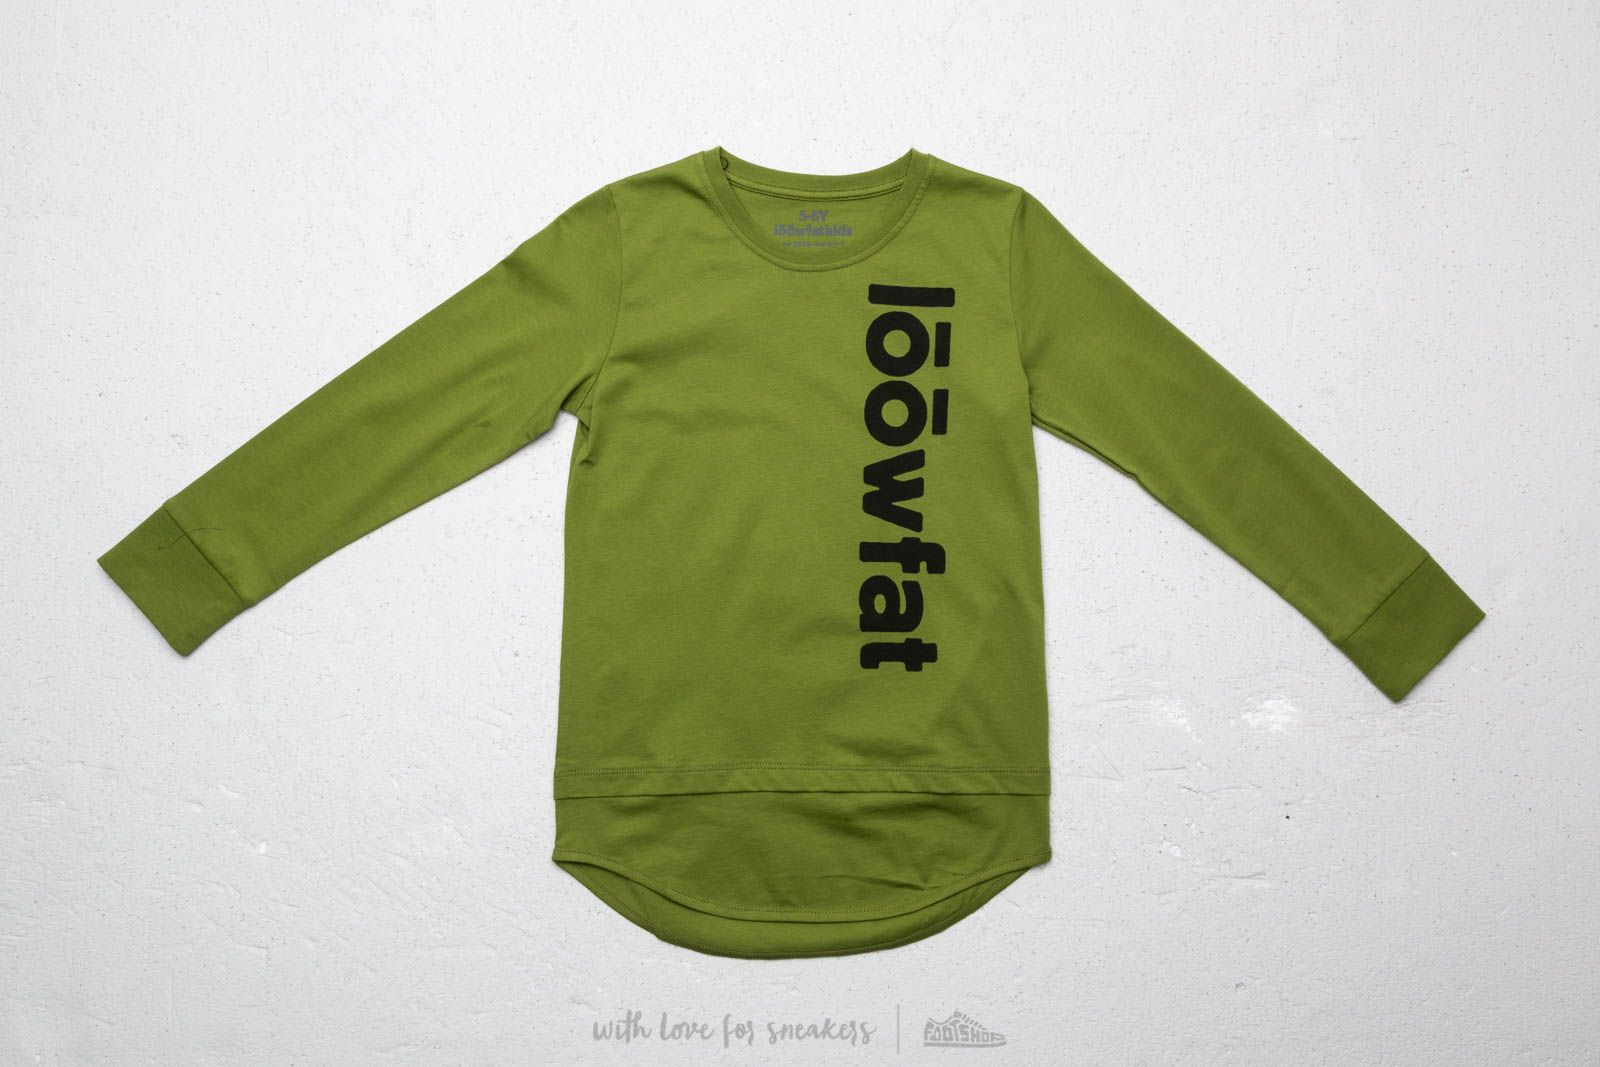 LoowFAT KIDS Si: Bling Longsleeve T-Shirt Green za skvelú cenu 24 € kúpite na Footshop.sk